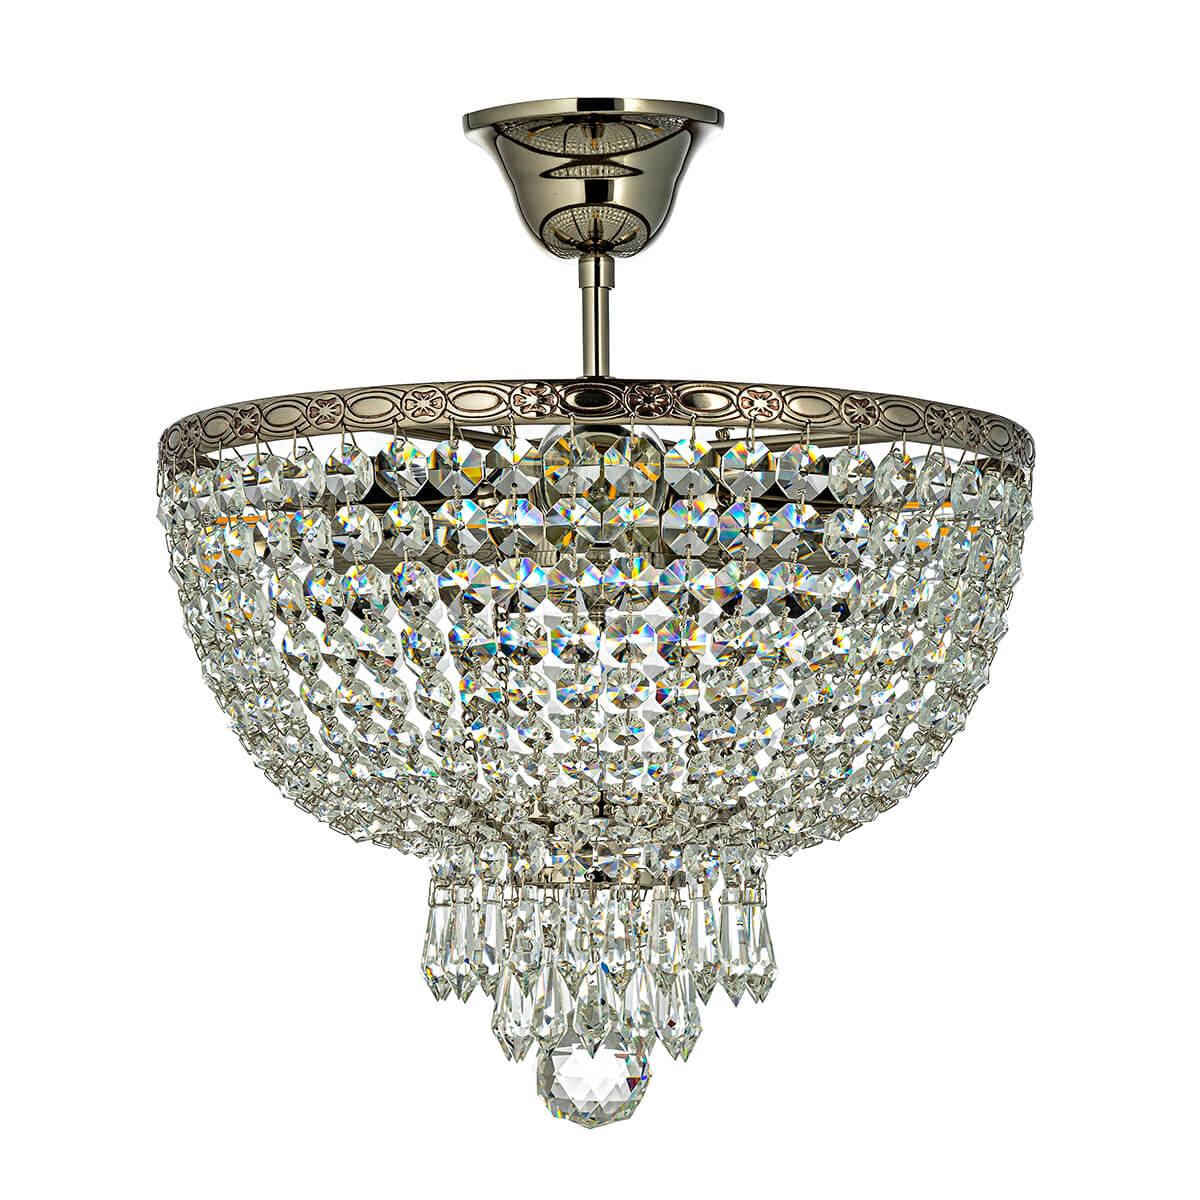 Потолочный светильник Arti Lampadari Nonna E 1.3.30.502 N цена и фото